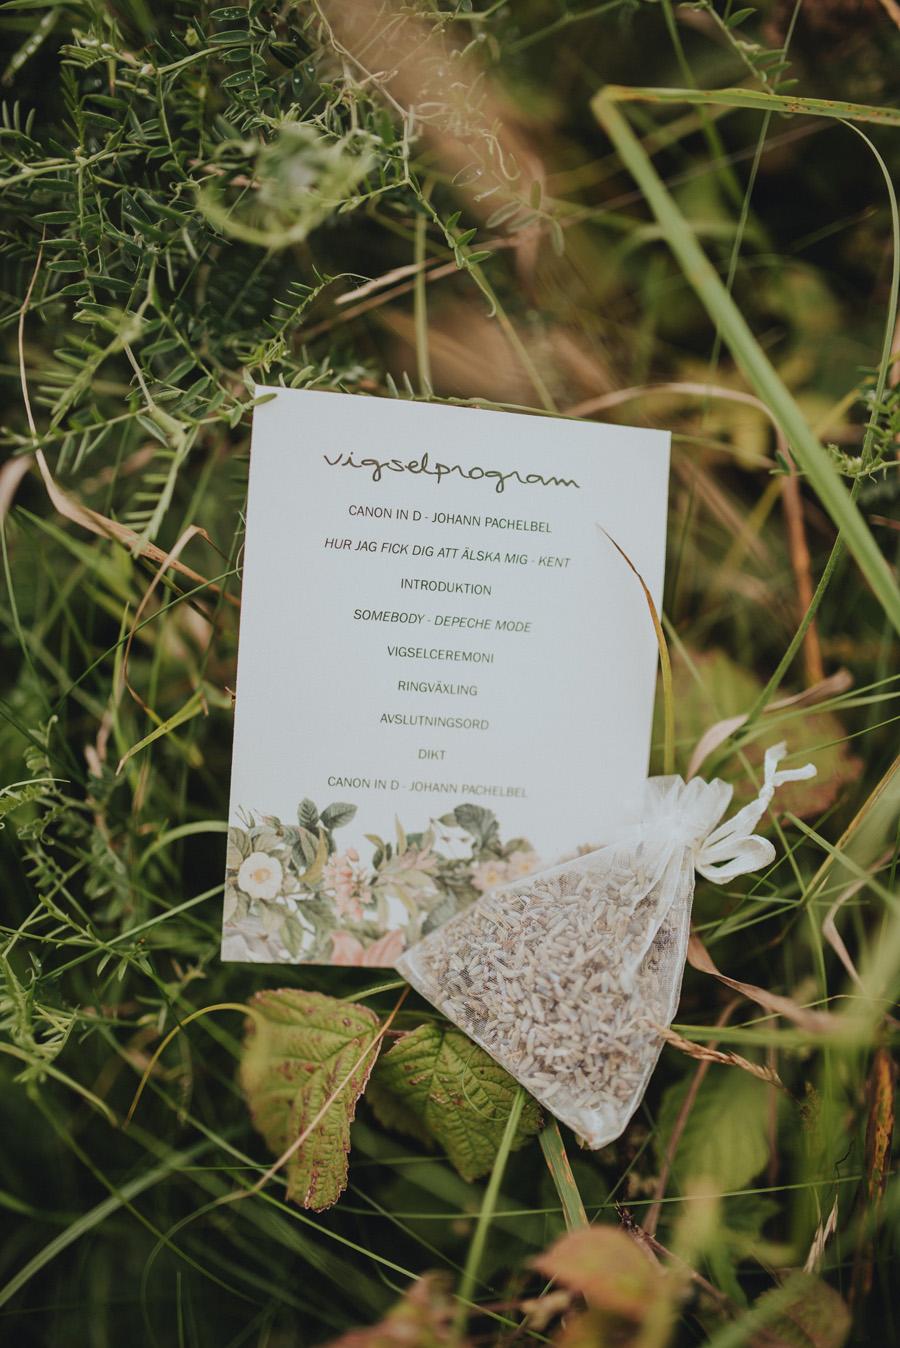 vigselprogram,bröllopsfotograf,bohemisk